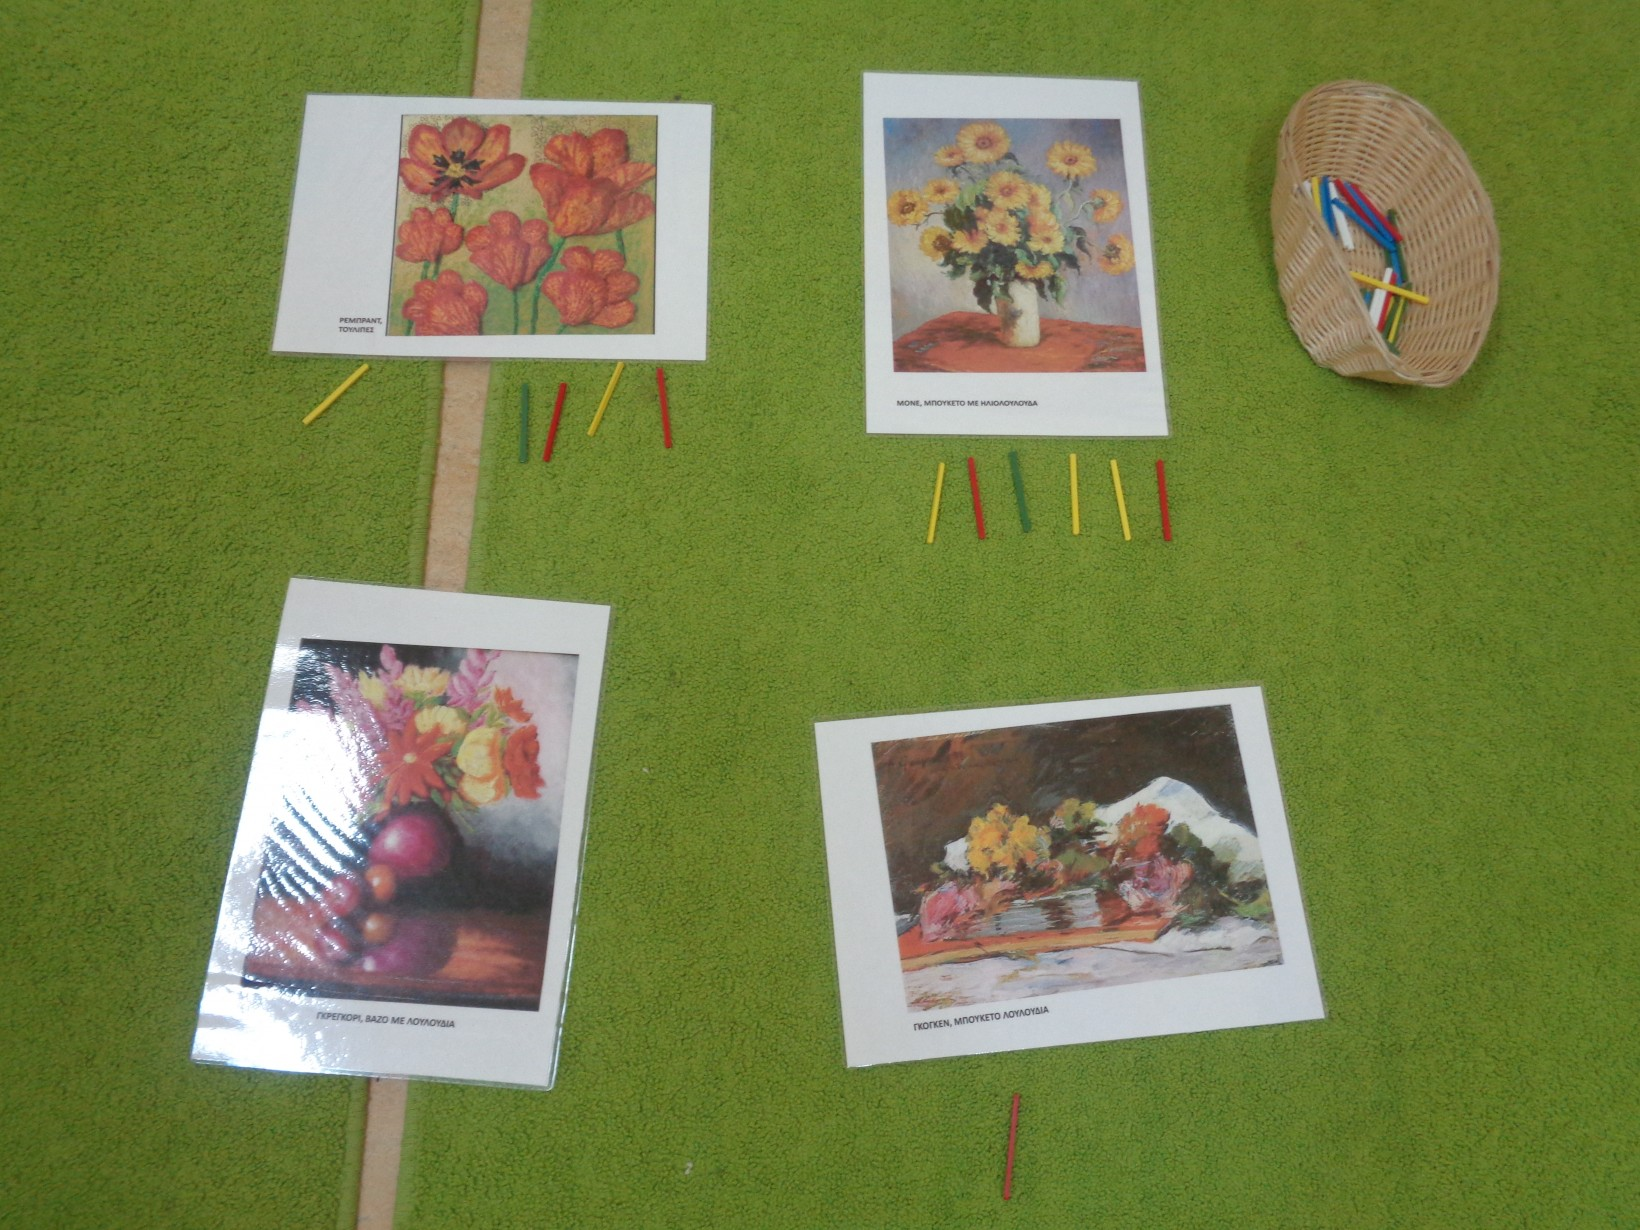 4932ac2fcb Λίγα λουλούδια αν θέλεις στείλε μου… (2ο μέρος)